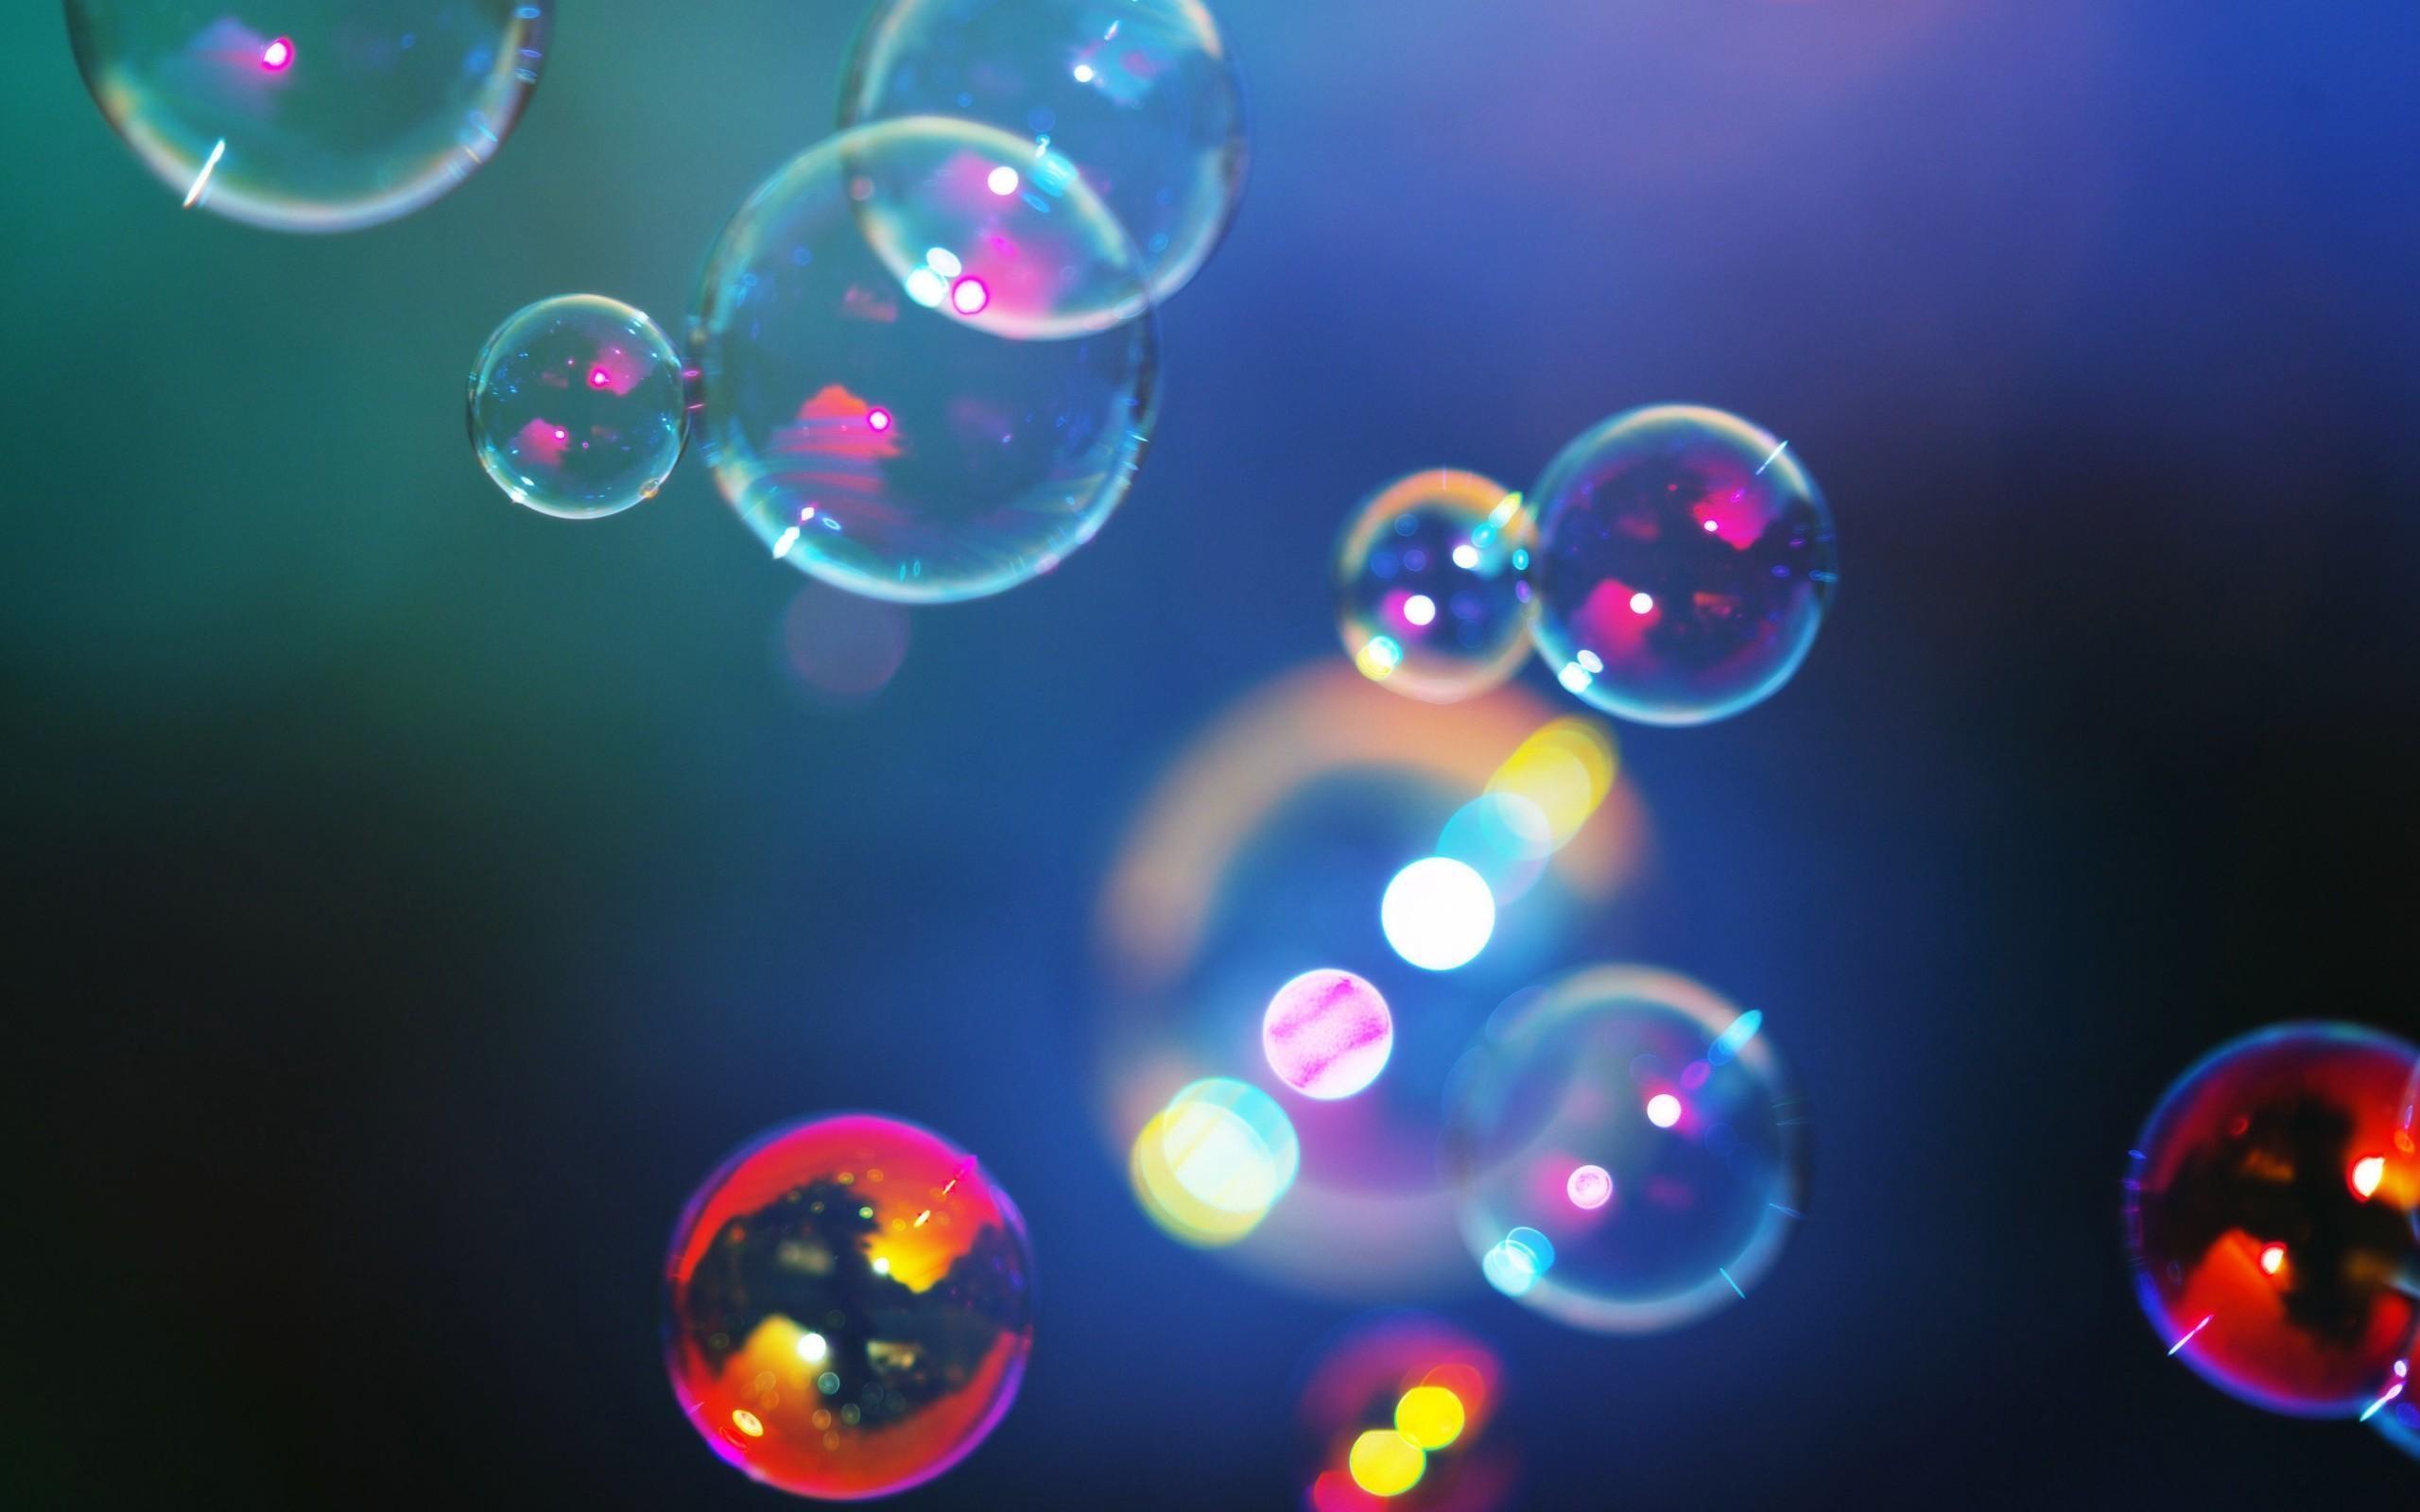 Shimmering Colorful Bubbles Hd Wallpaper   Wallpaper List